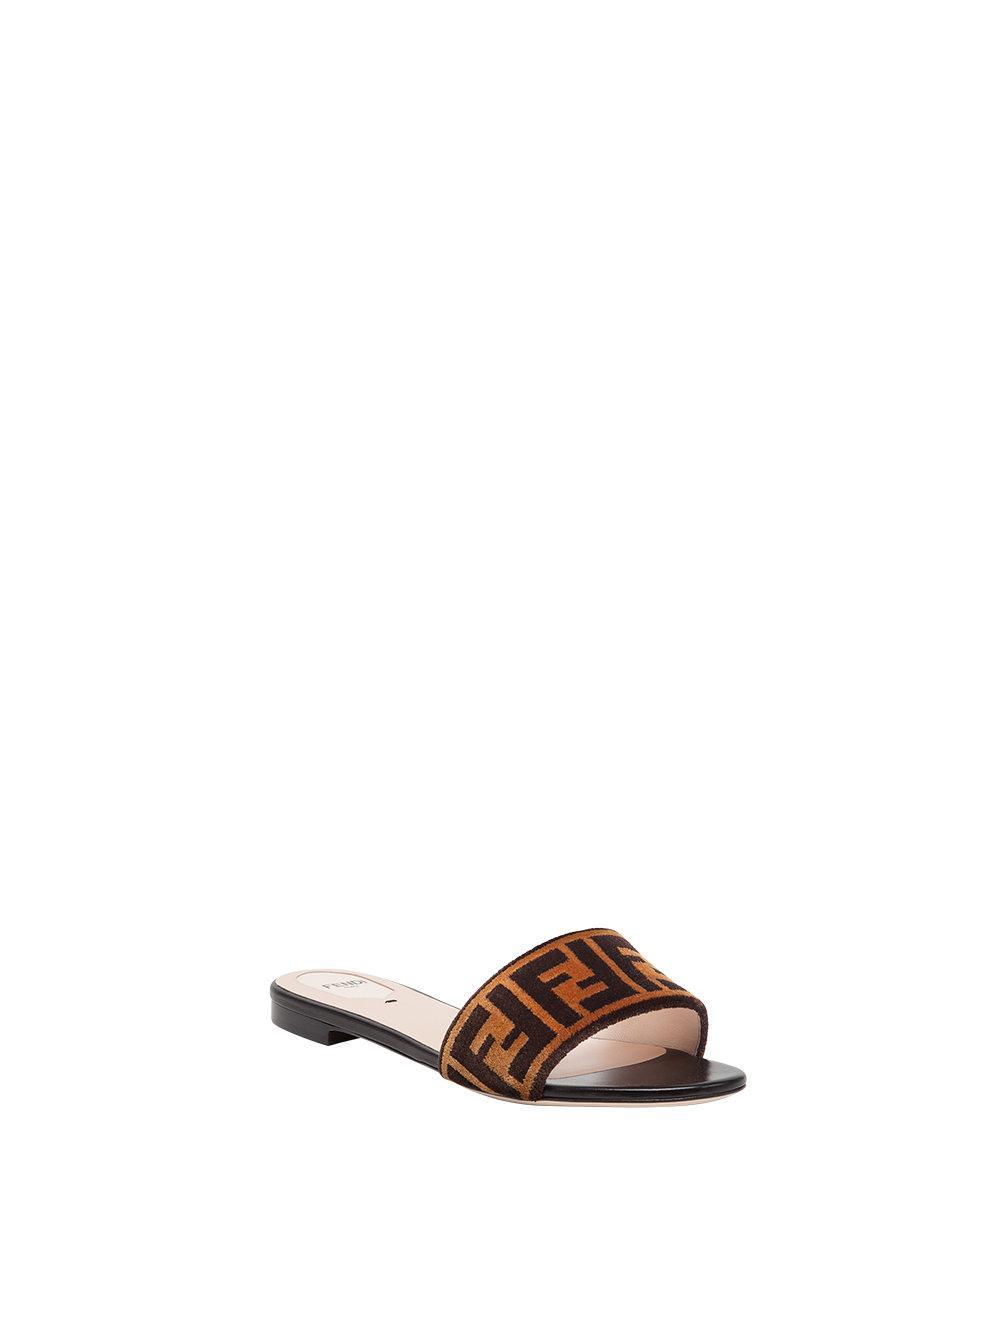 4f0caa86b52e4 Lyst - Fendi Open Toe Flat Sandals in Brown